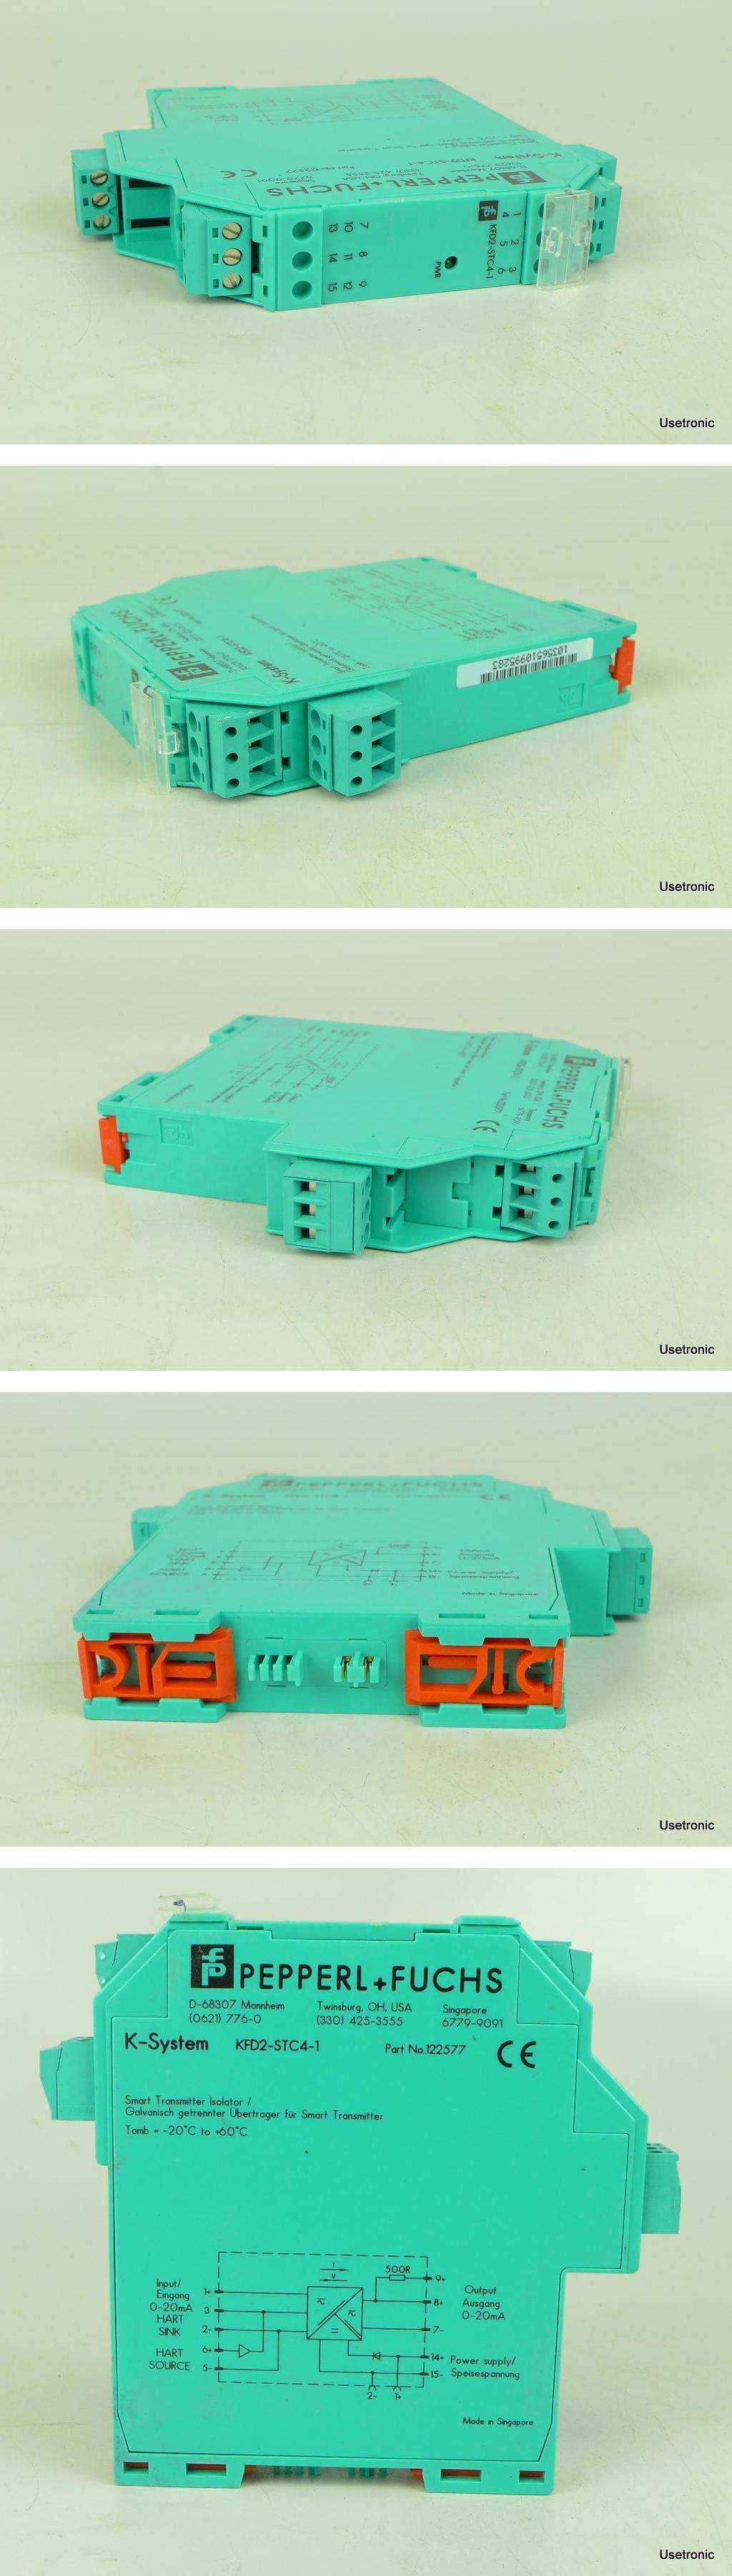 Fuchs KFD2-STC4-1 122577